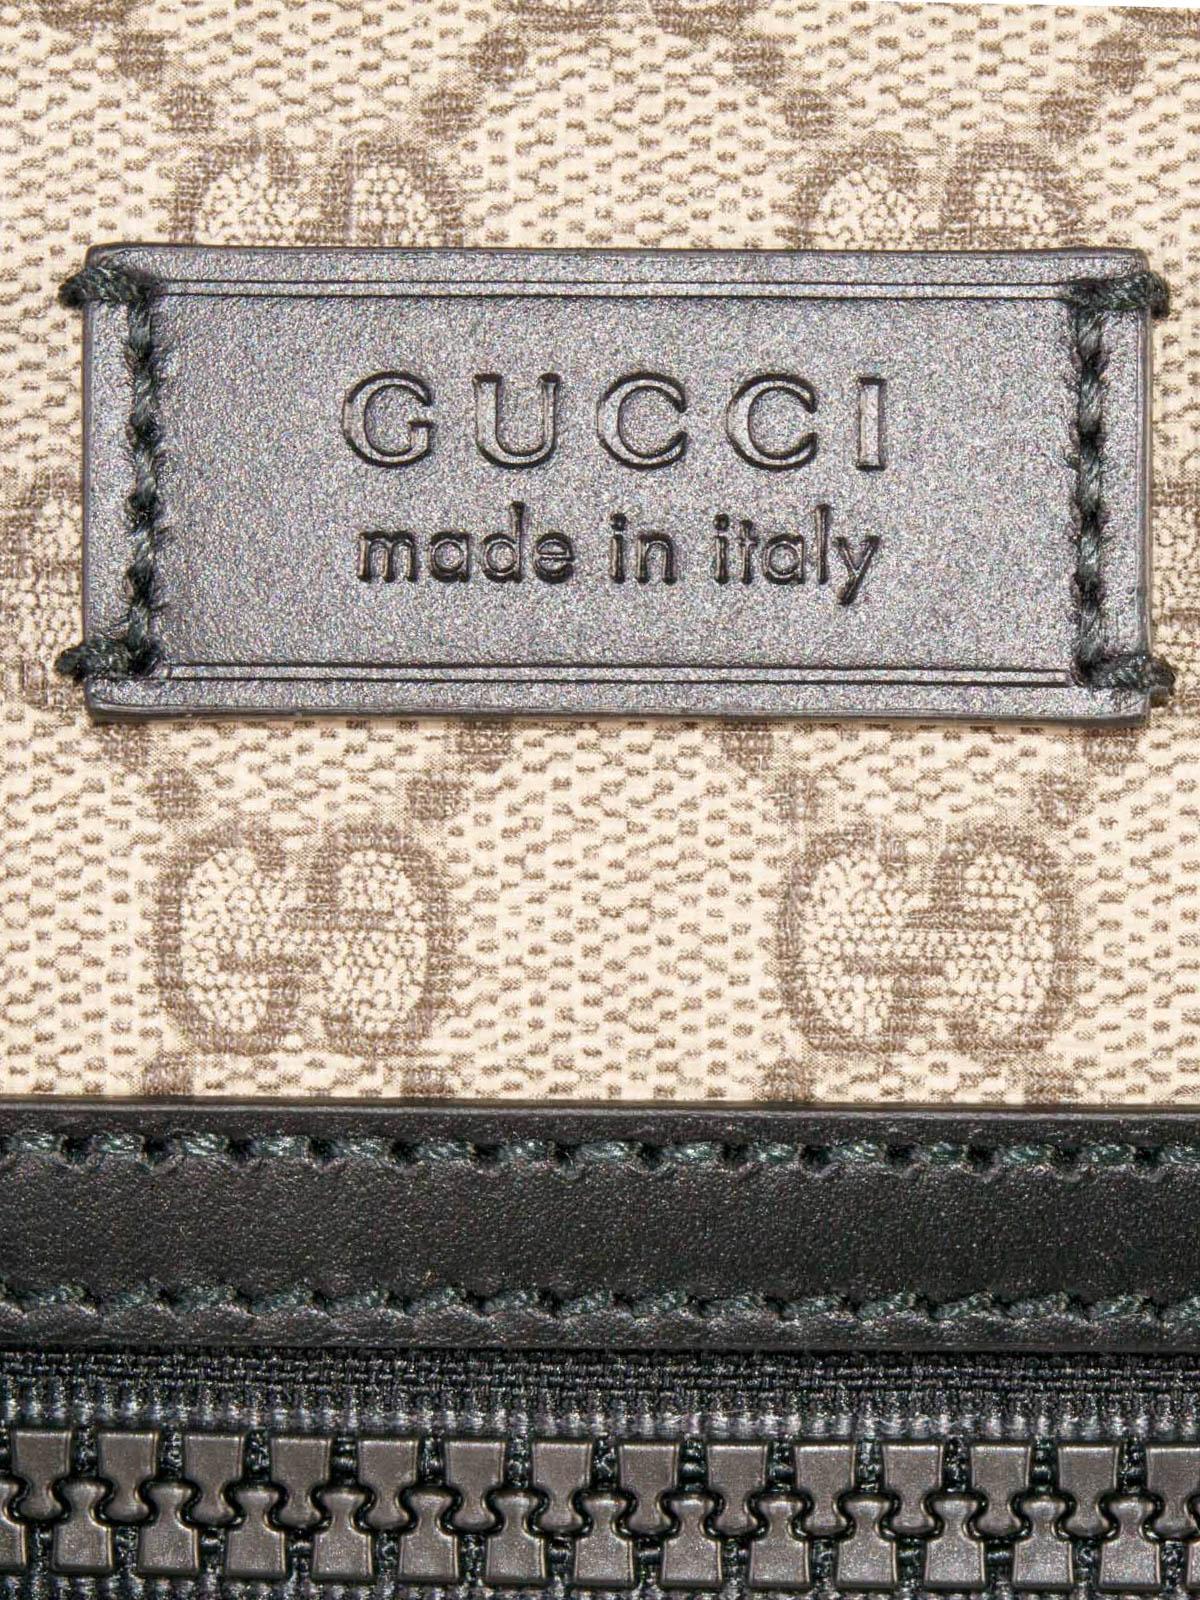 Gucci - Bolsa Bandolera Gg Supreme - Beis - Bolsas bandoleras ... ca7e94edb2